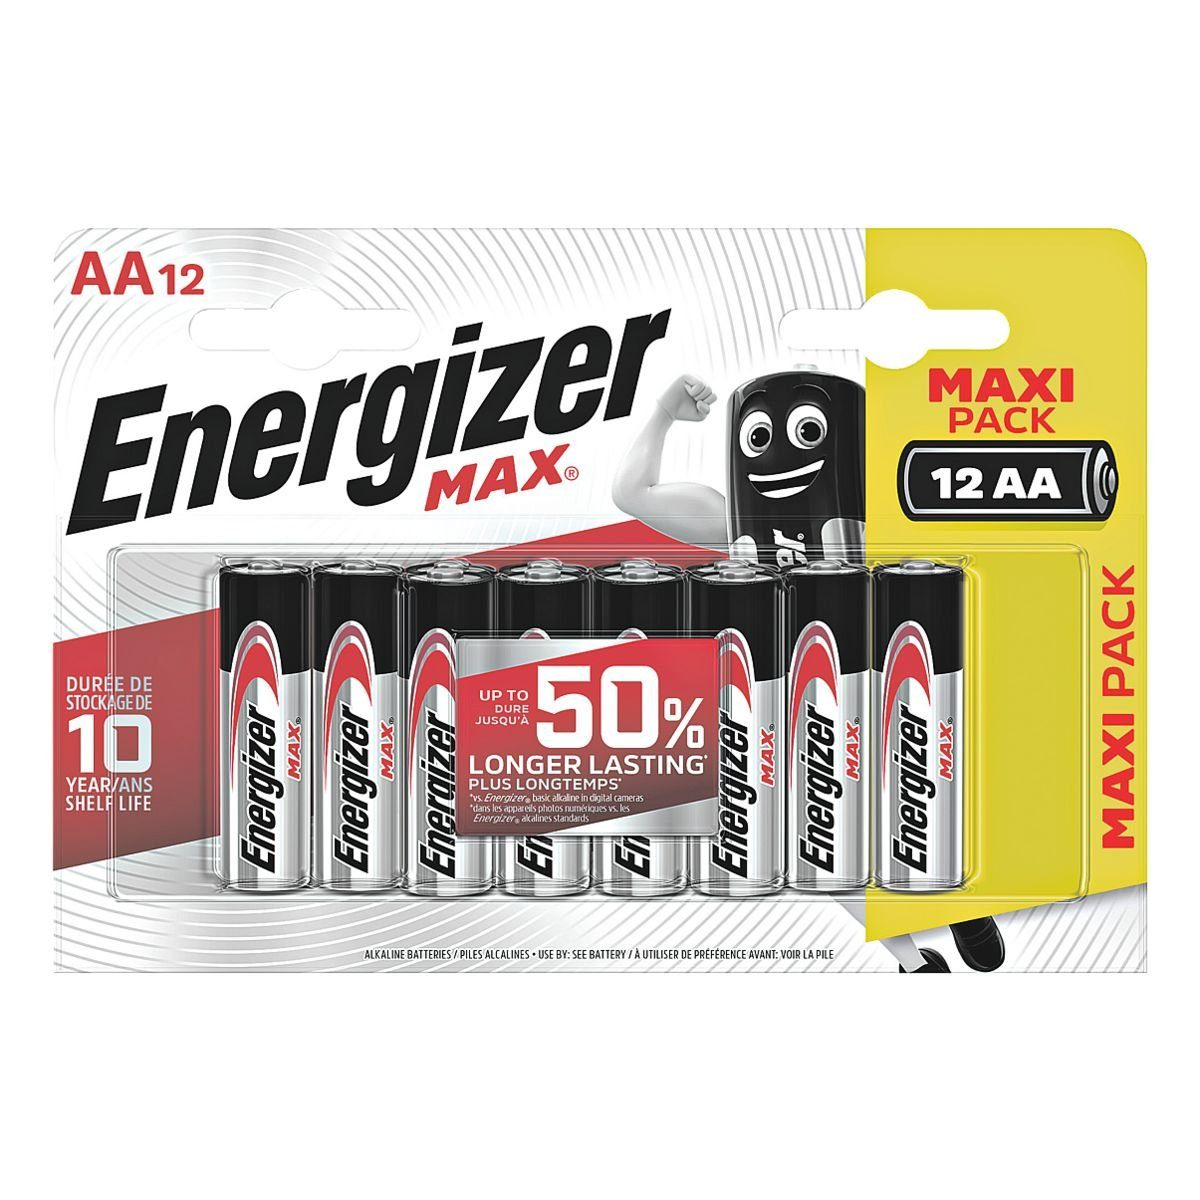 Energizer 12er-Pack Batterien »Max Alkaline« Mignon / AA / LR06